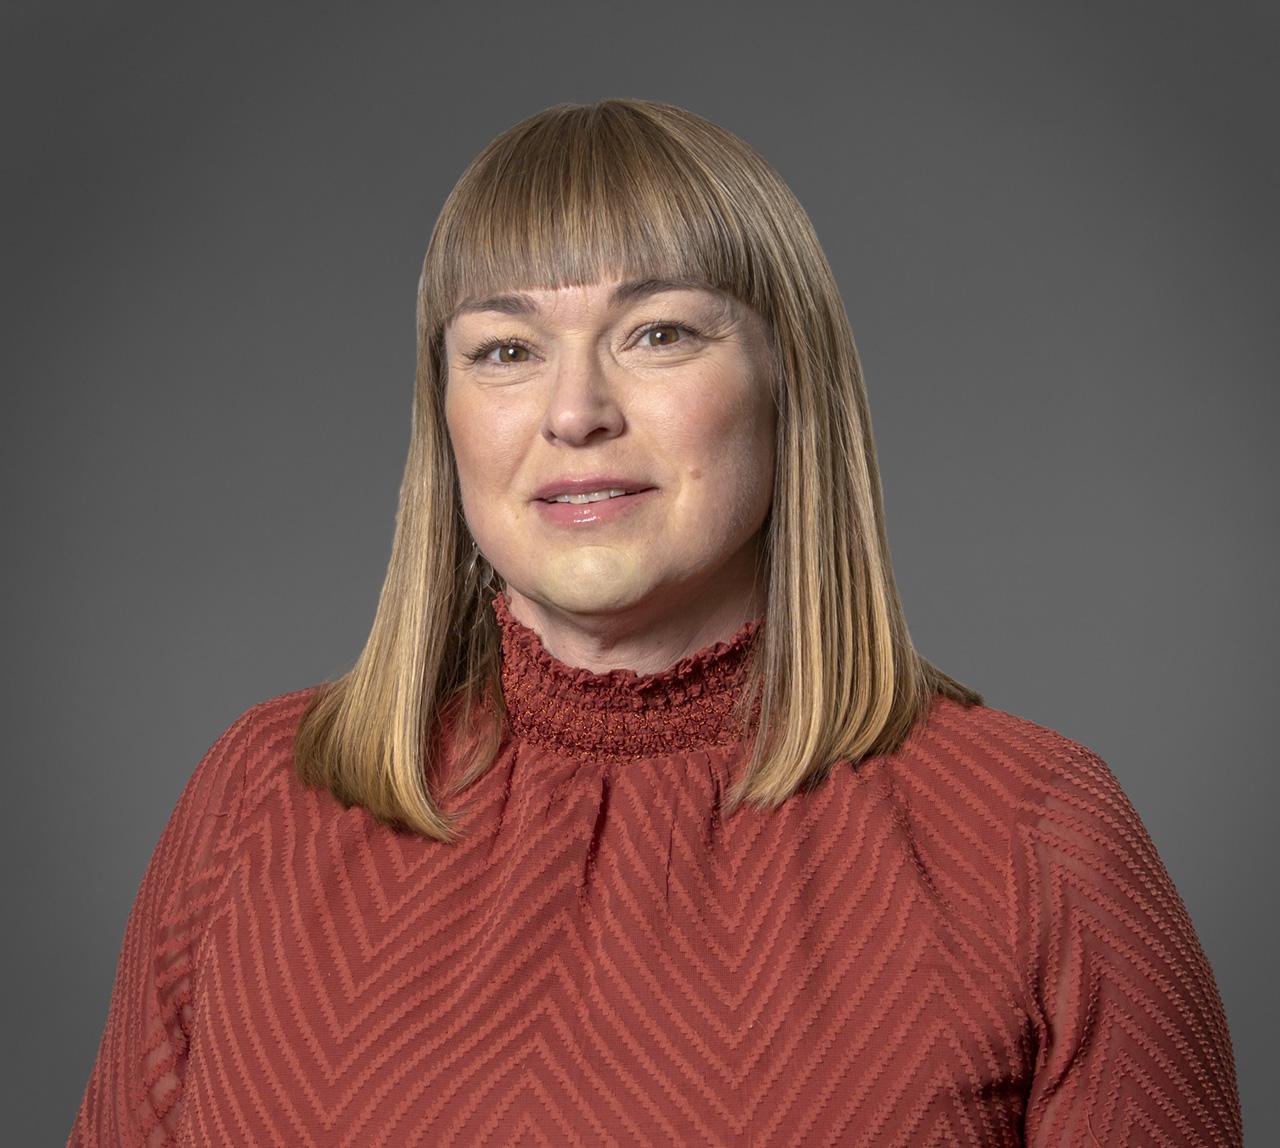 Anna Forsman